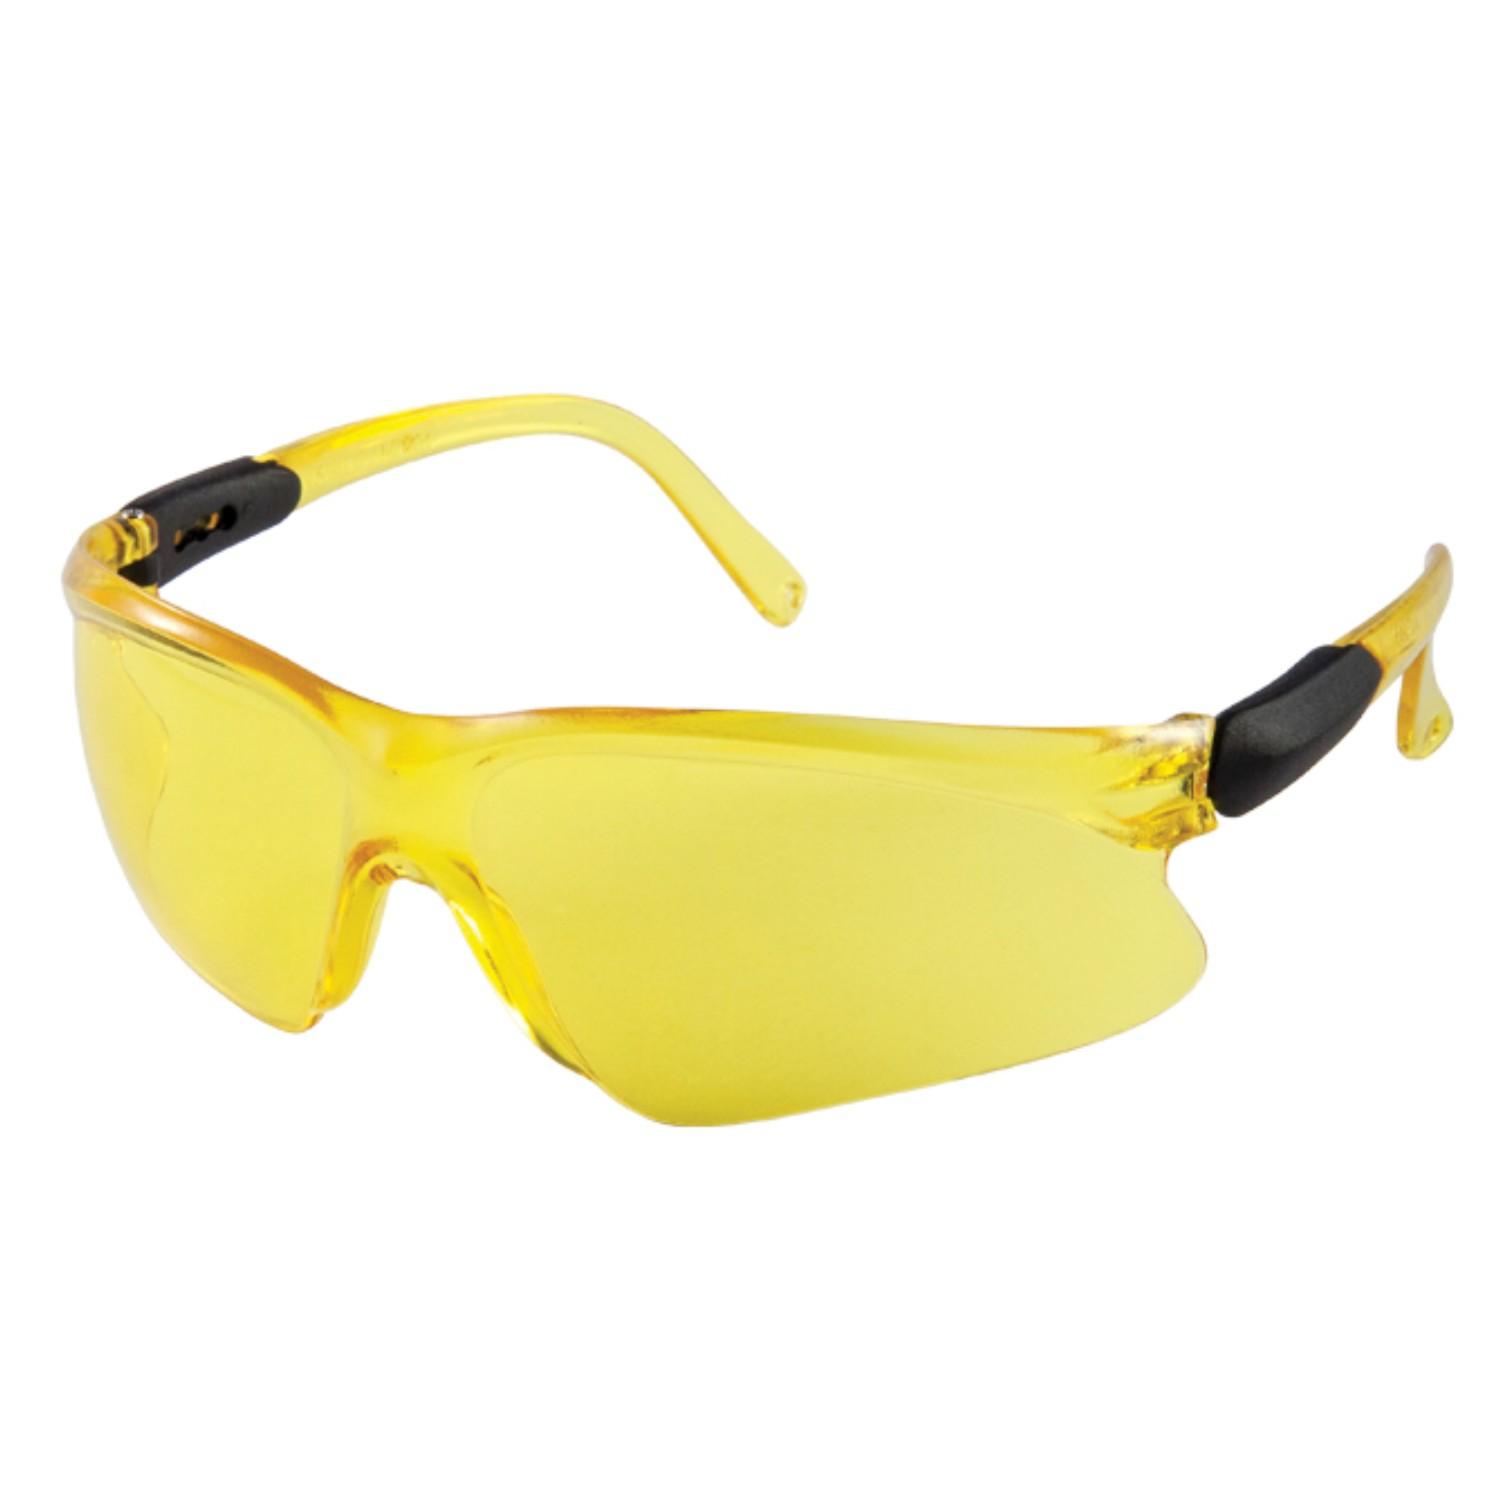 Oculos Protecao Polipropileno Lince Amarelo 611 - Kalipso